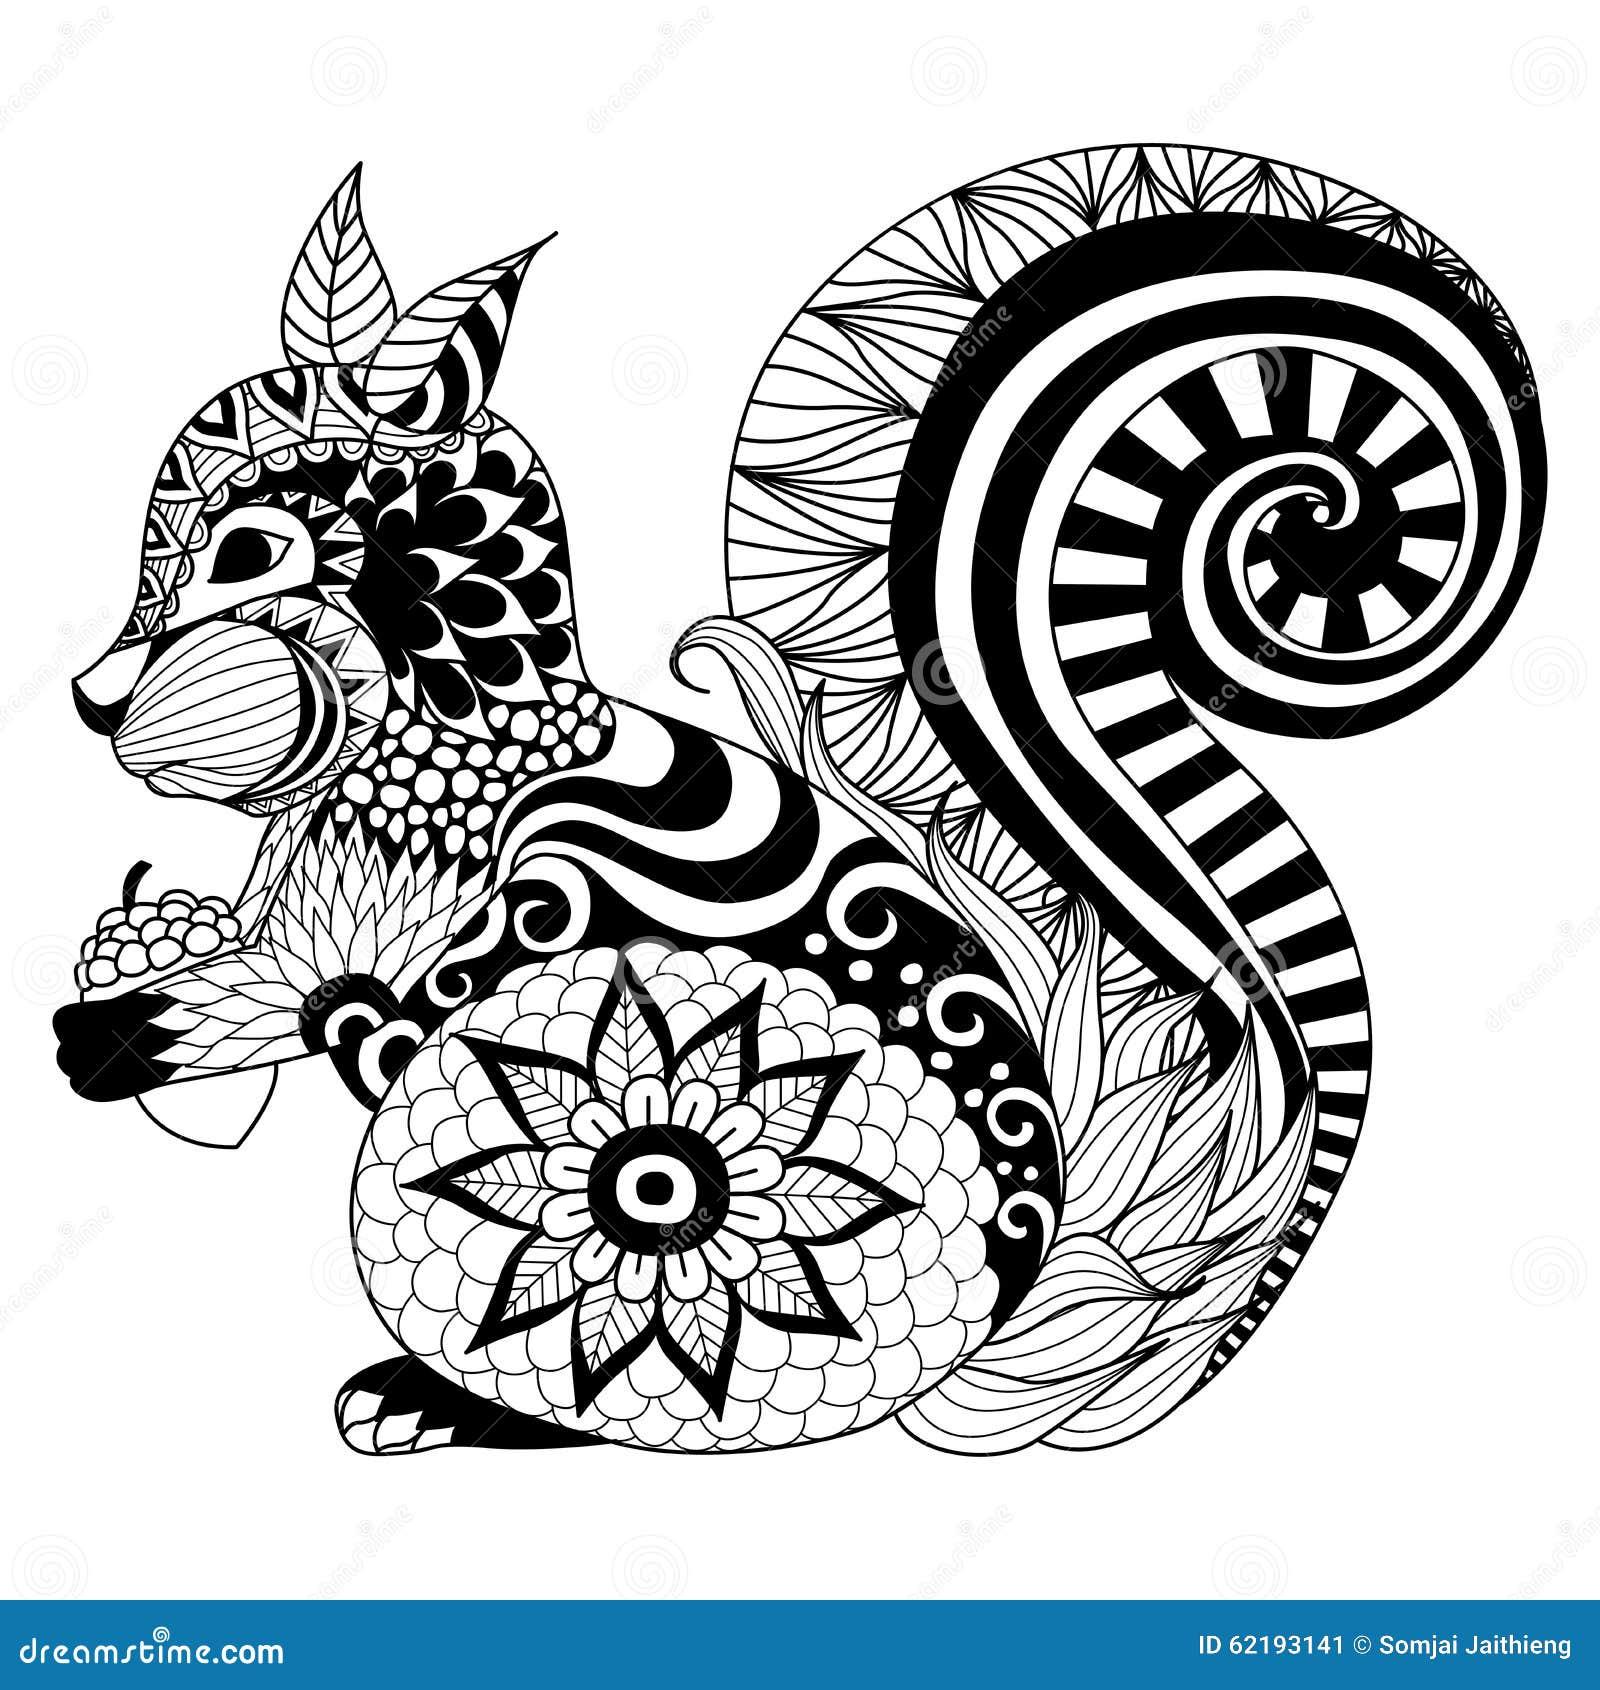 Squirrel Zentangle Style For Coloring Booktattoot Shirt Designlogo